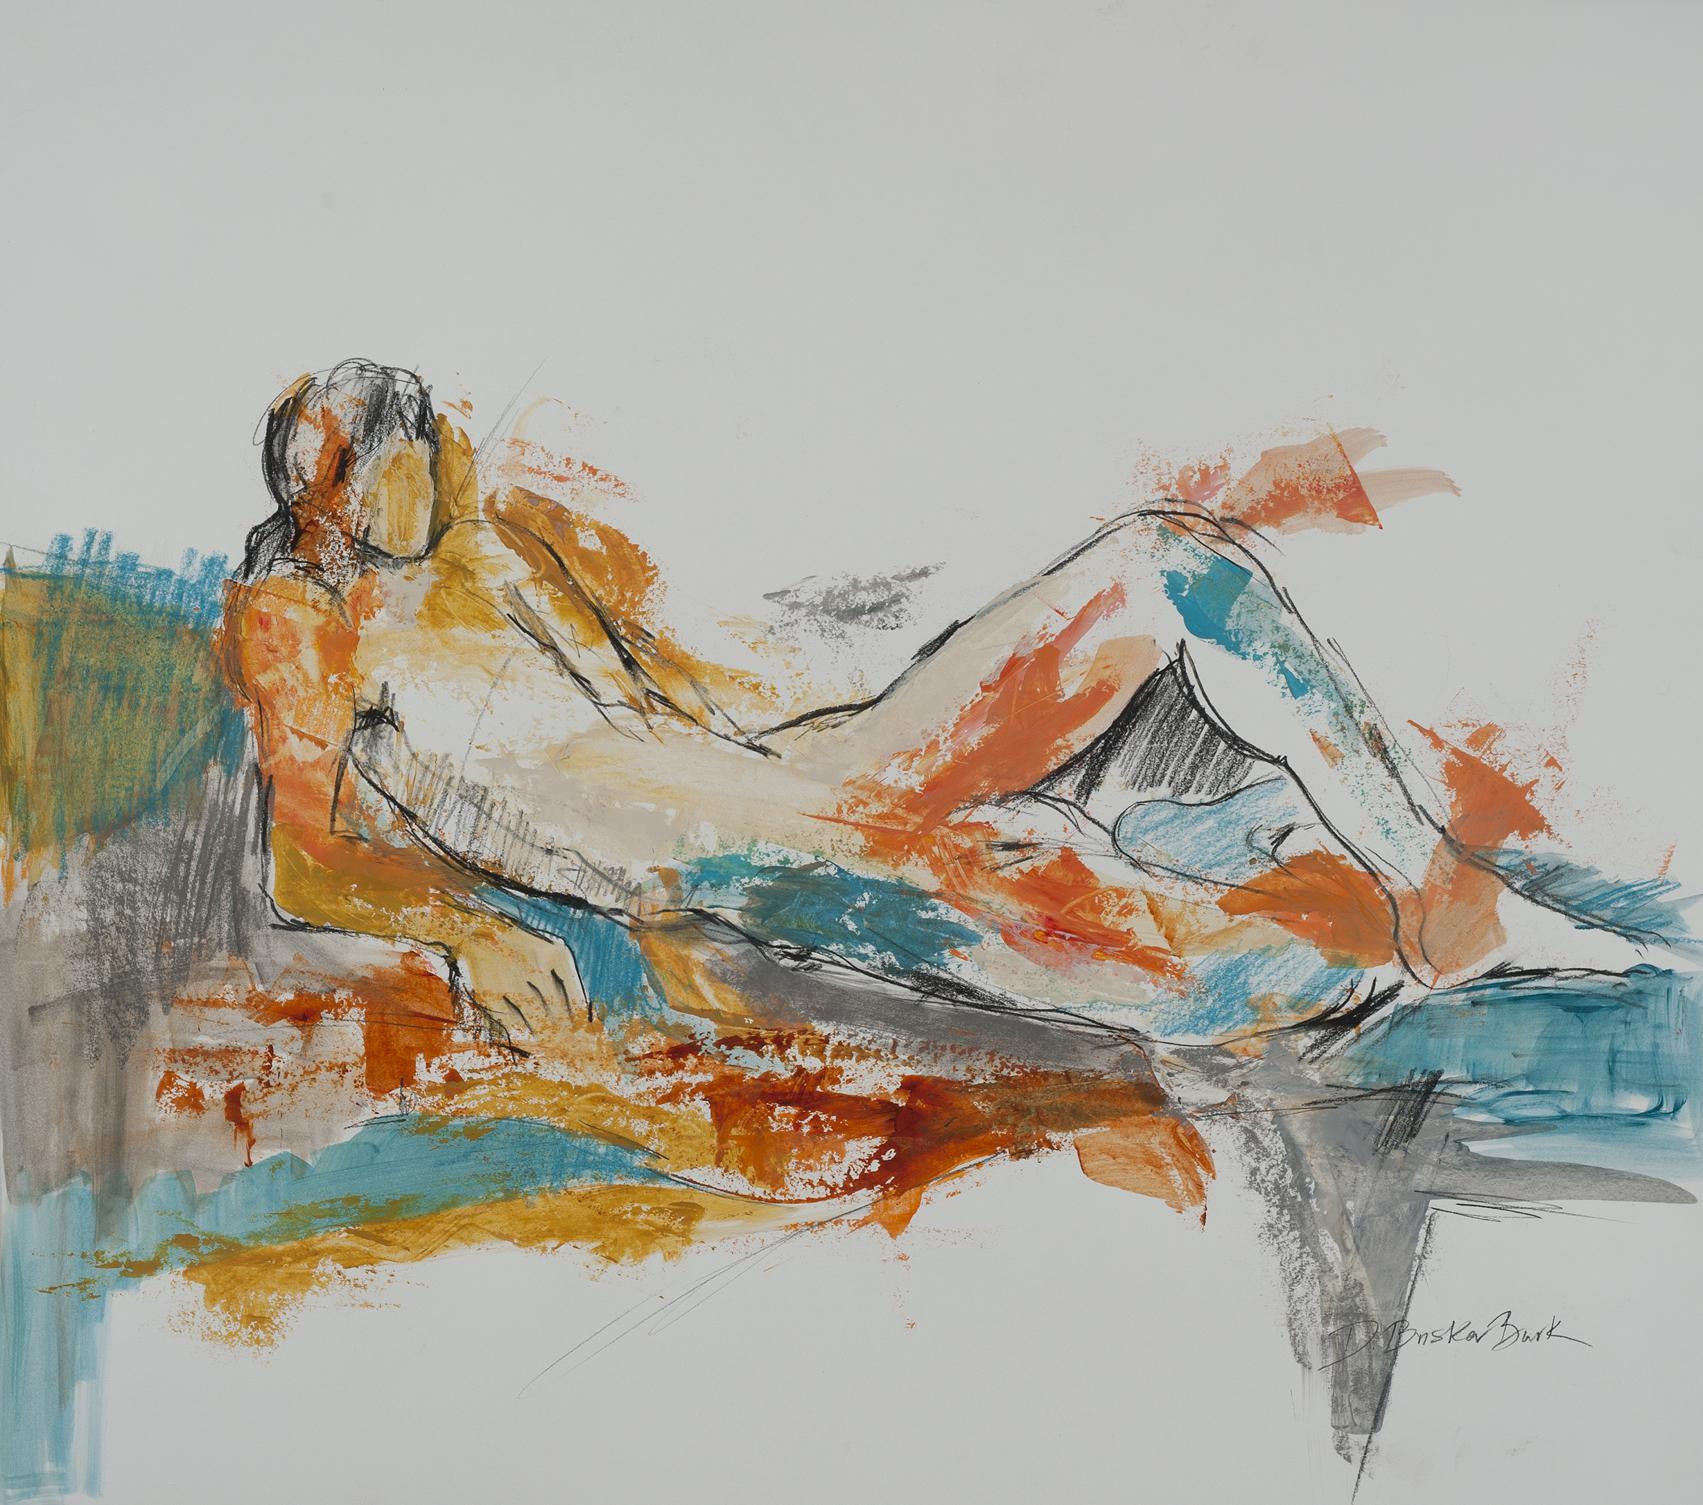 Formscape II, reclining figure w_turquoise & sienna, 26X20, by Deborah Brisker Burk